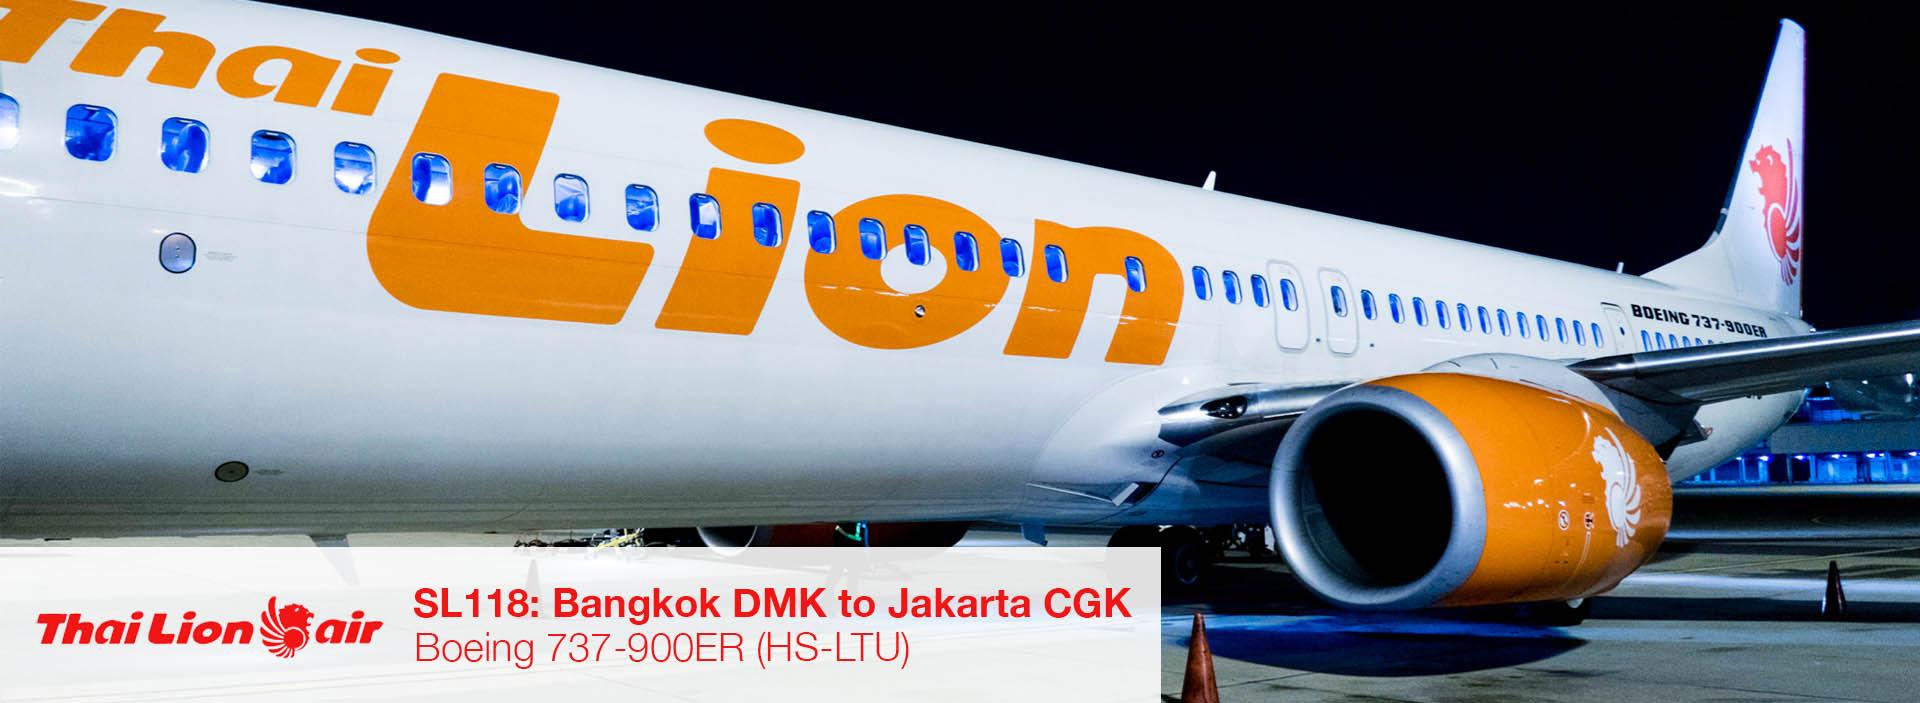 Flight report thai lion air 737 900er from bangkok dmk to jakarta cgk stopboris Images